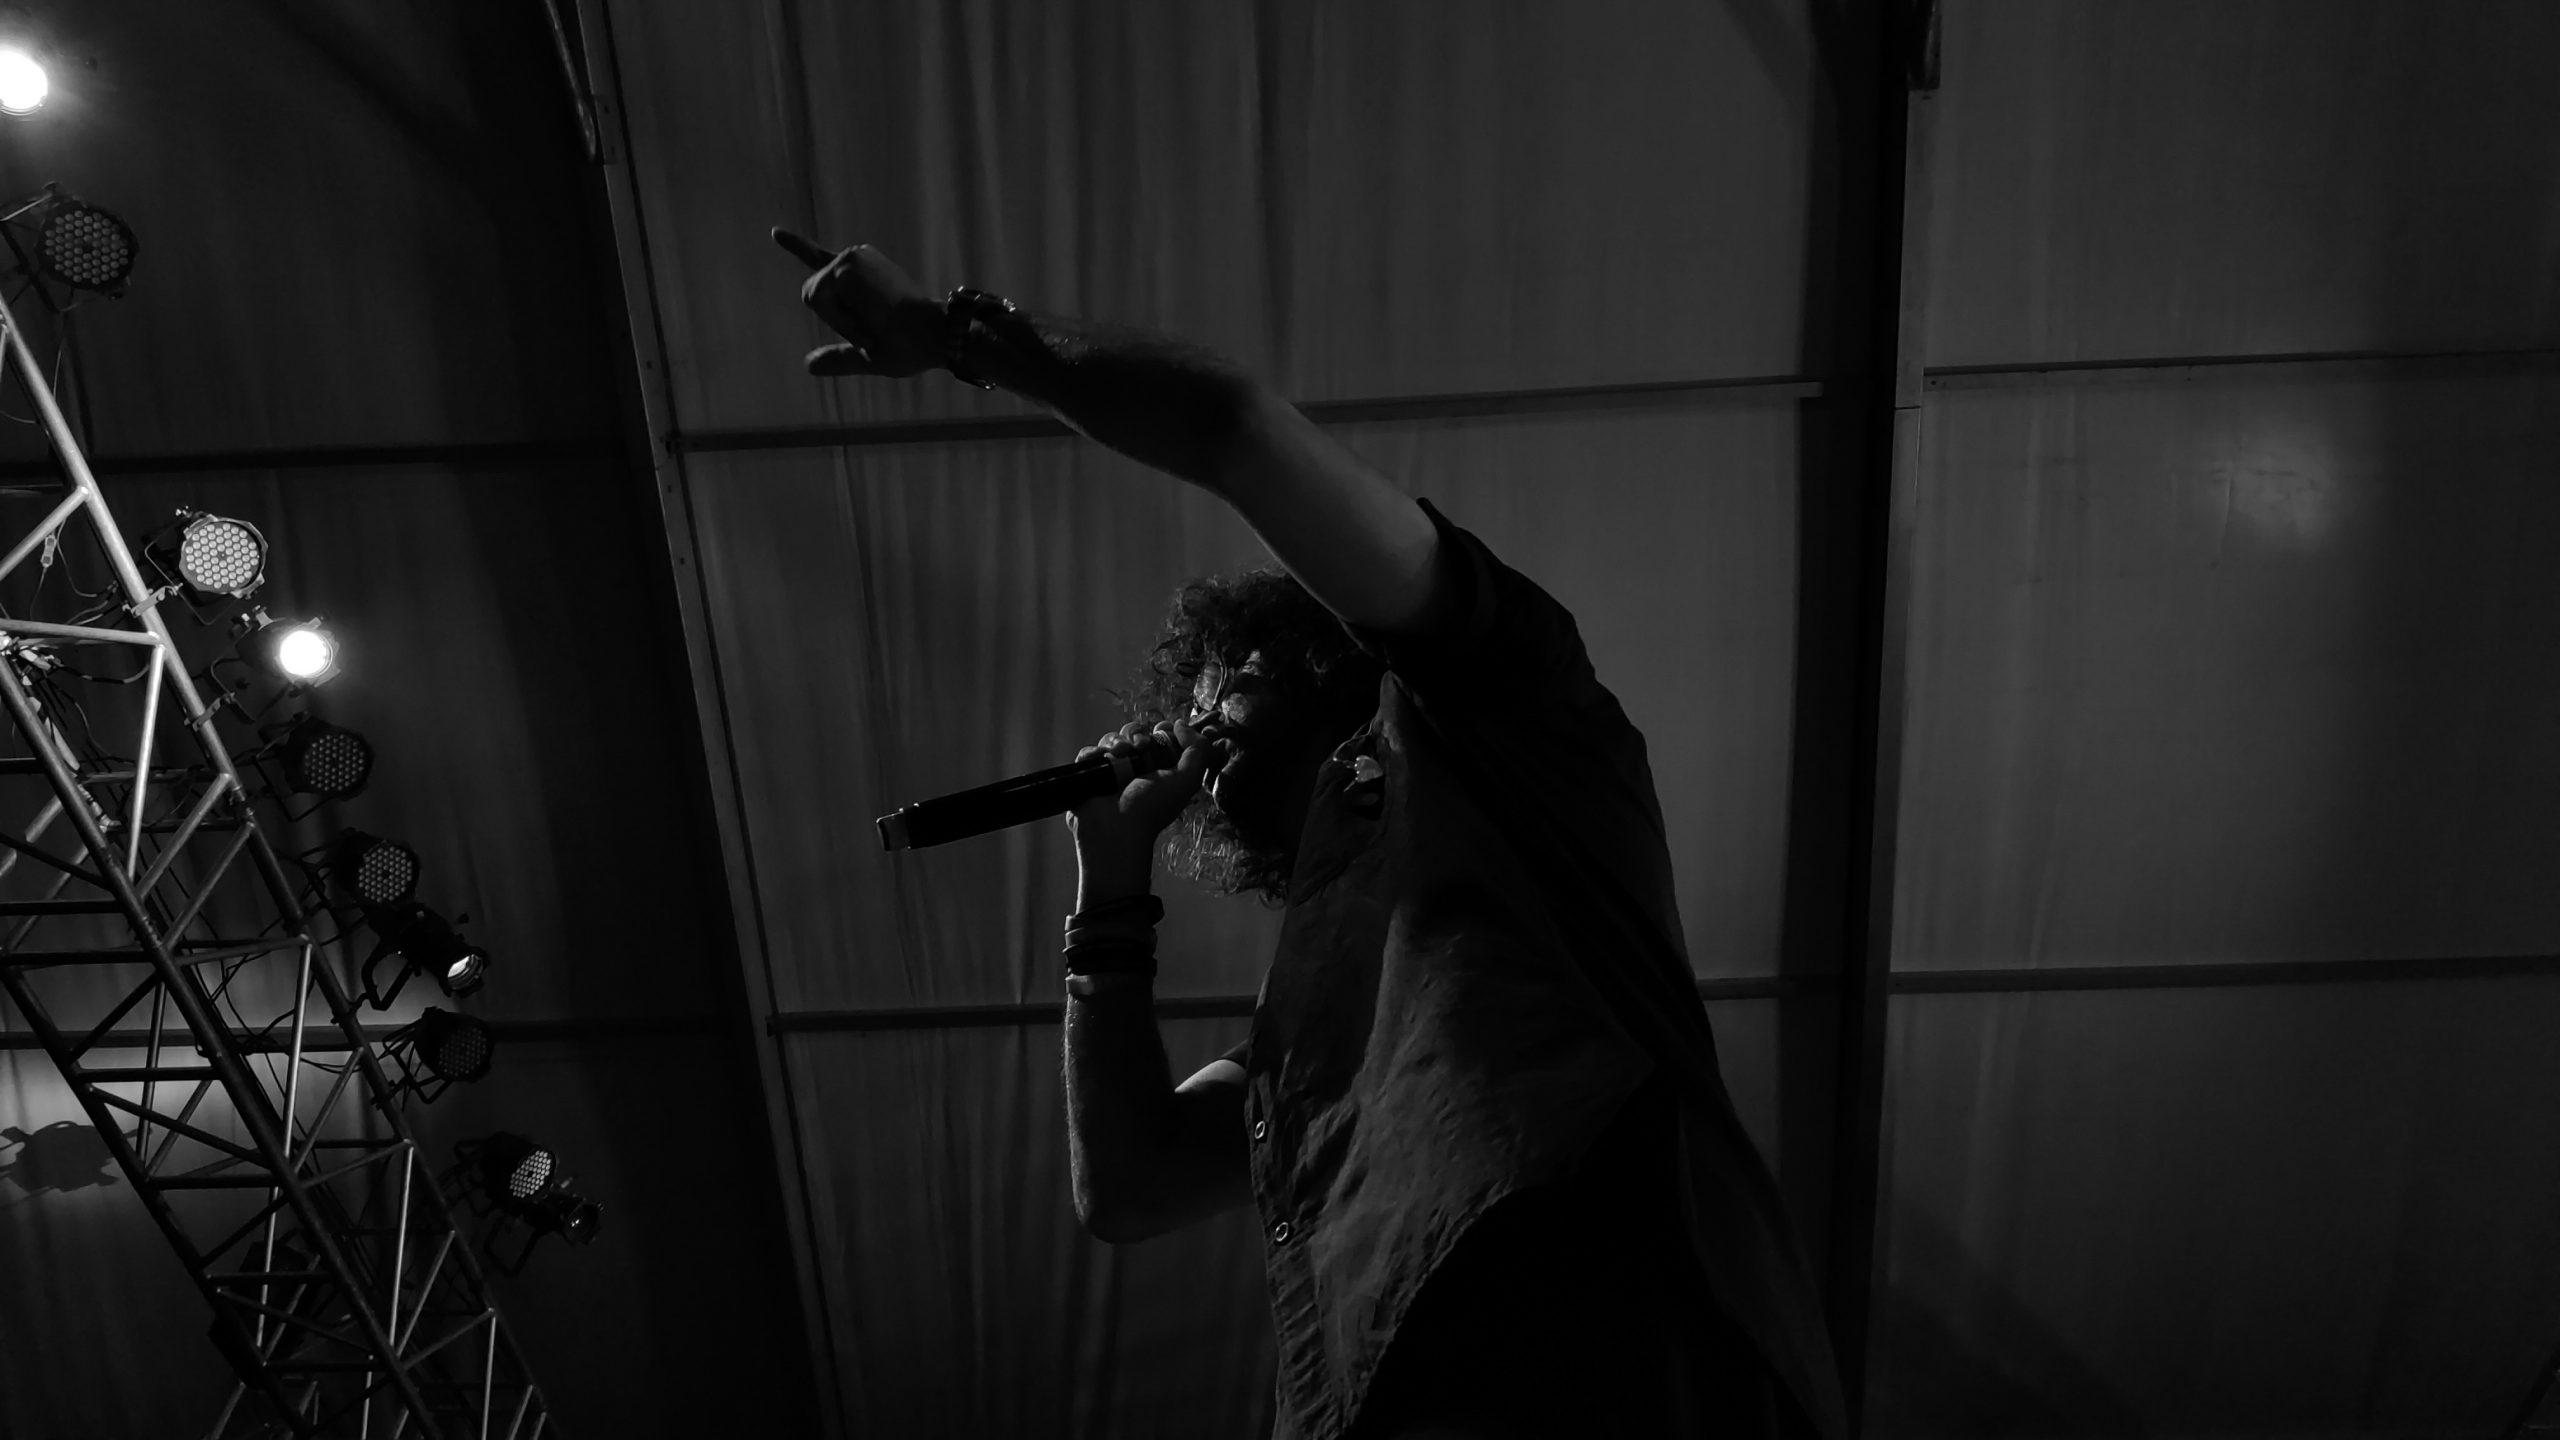 Singer in Concert